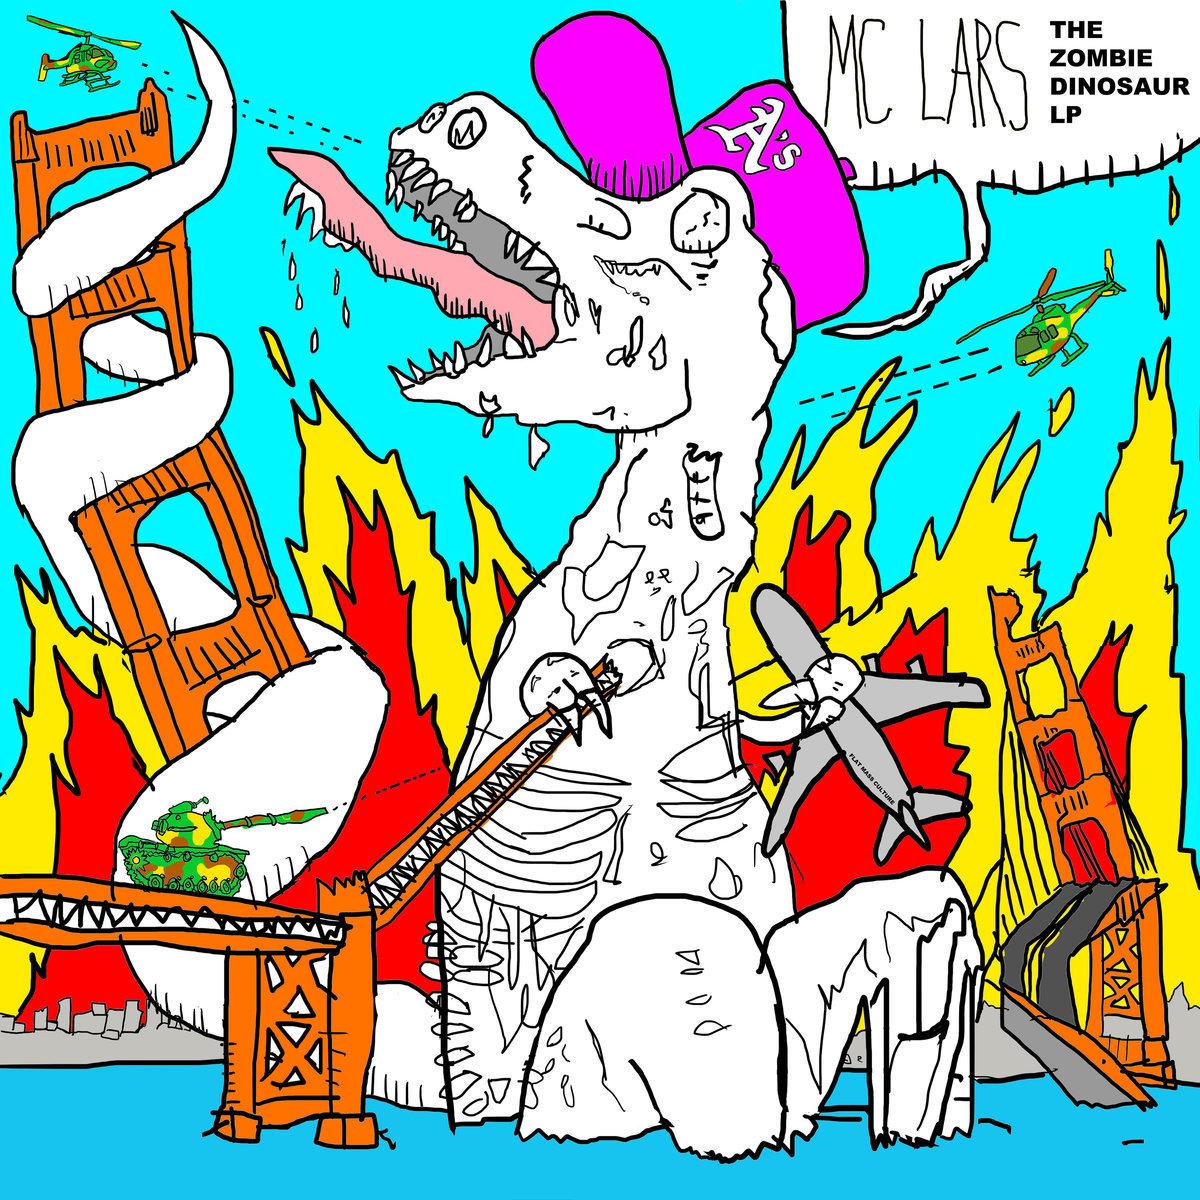 MC Lars Zombie Dinosaur LP